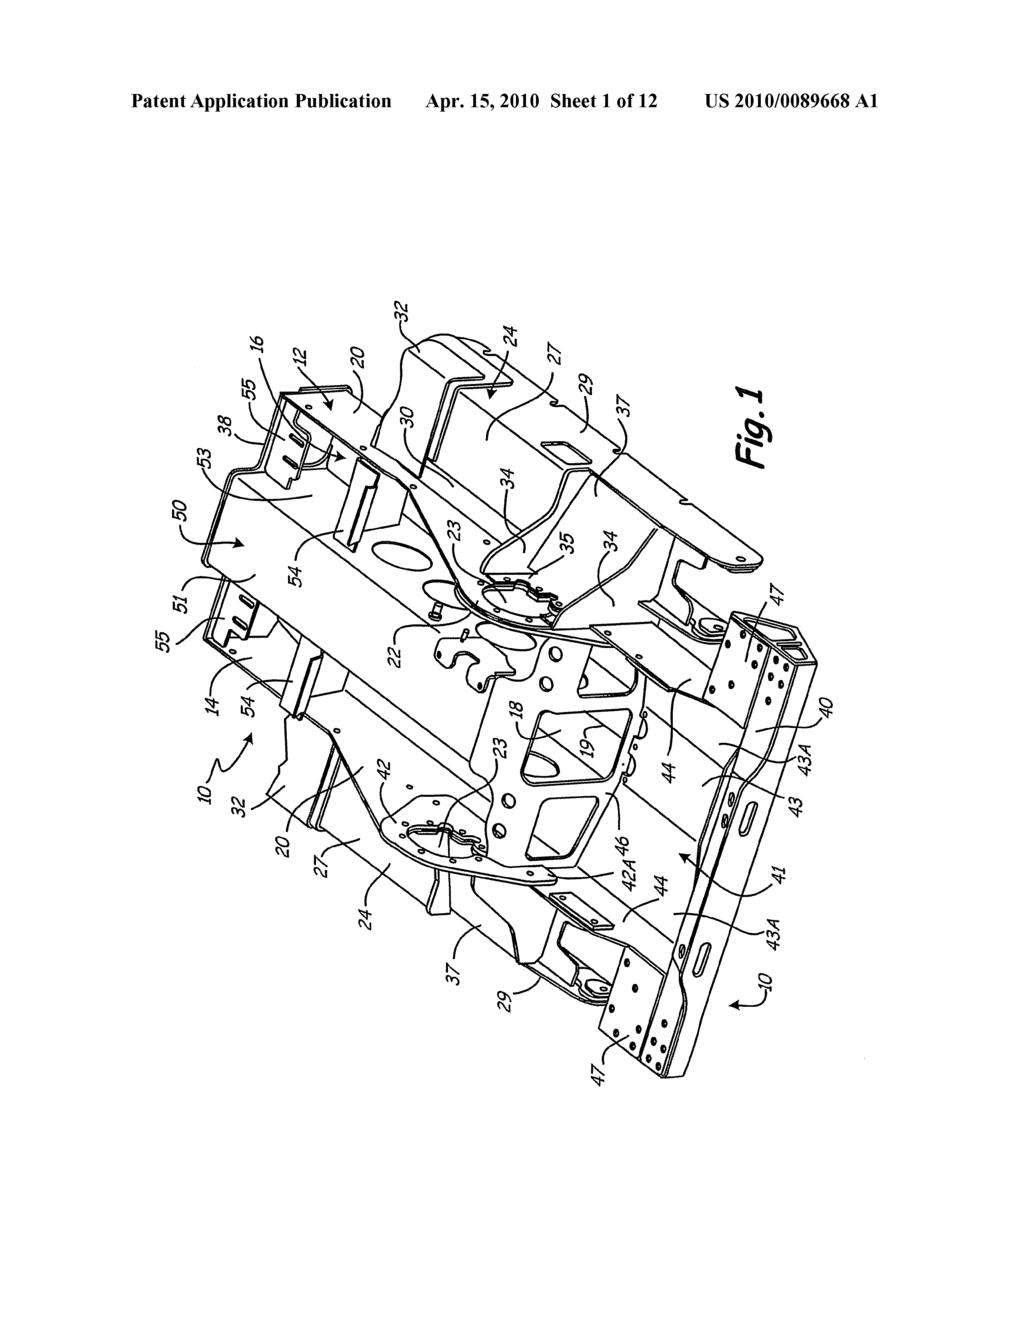 Dodge Caravan Undercarriage Parts. Dodge. Auto Wiring Diagram